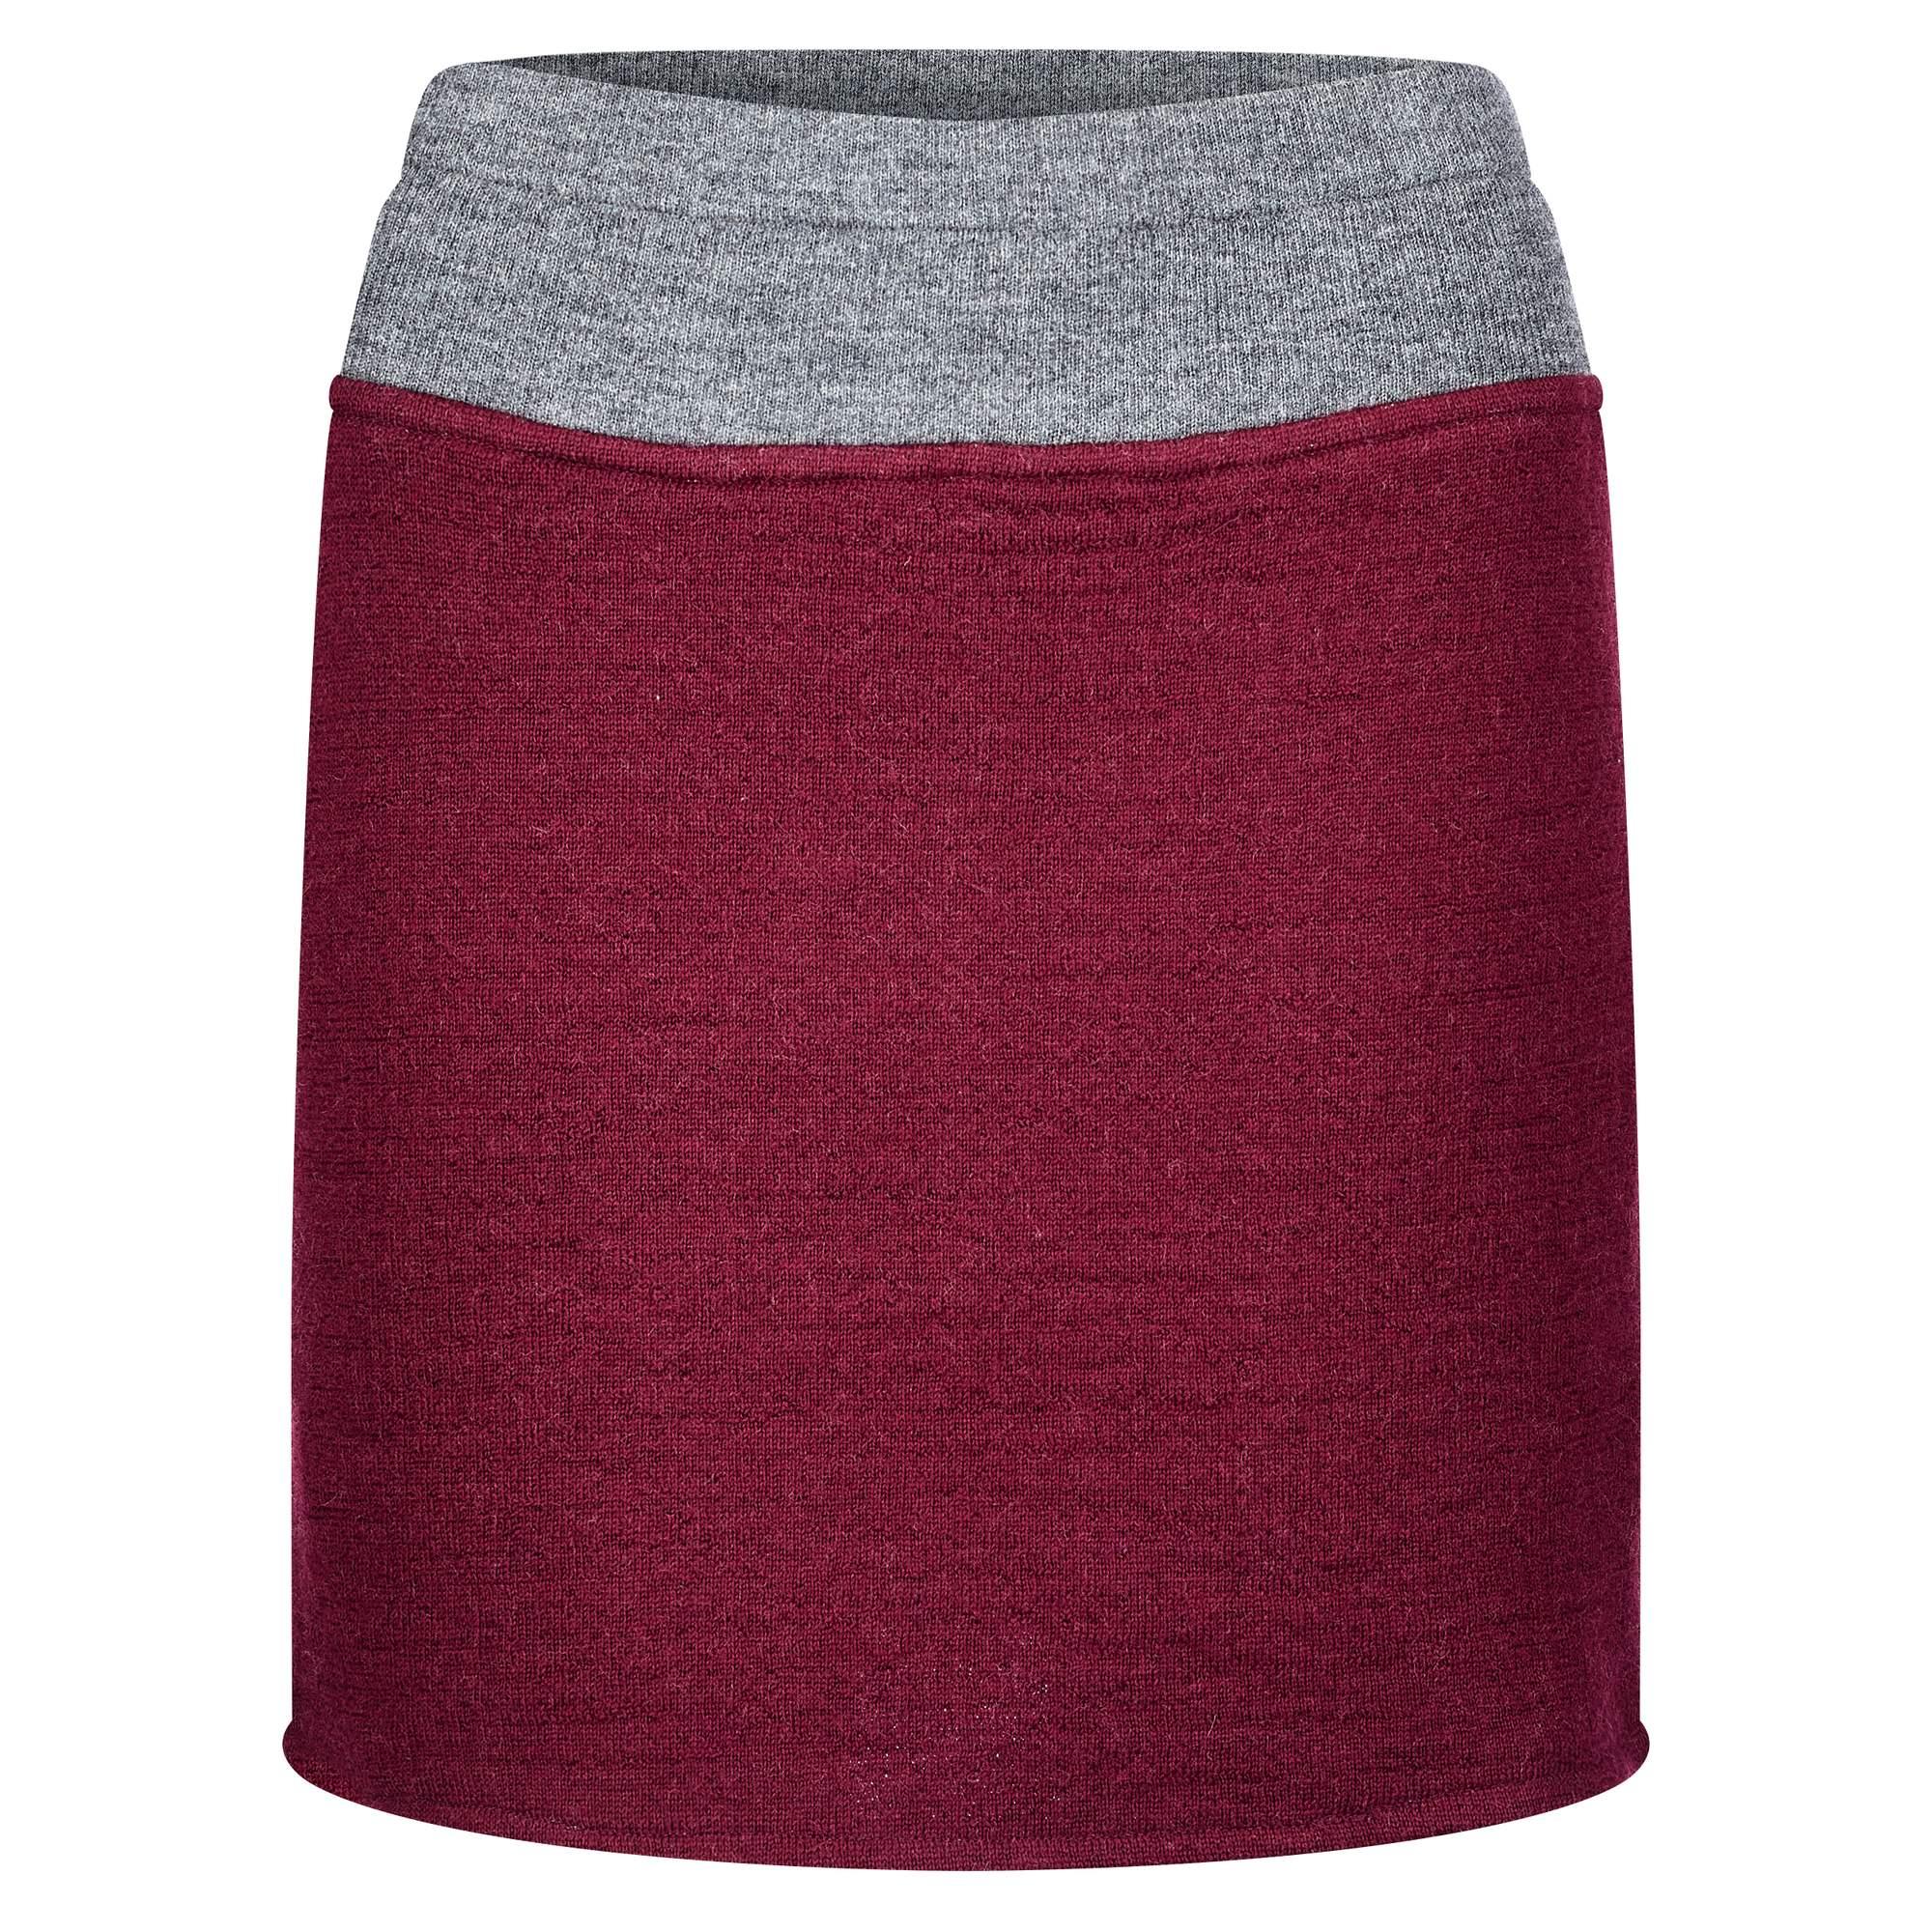 Himalaya Skirt DF-1031 Frauen Gr. L - Rock - rotbraun grau